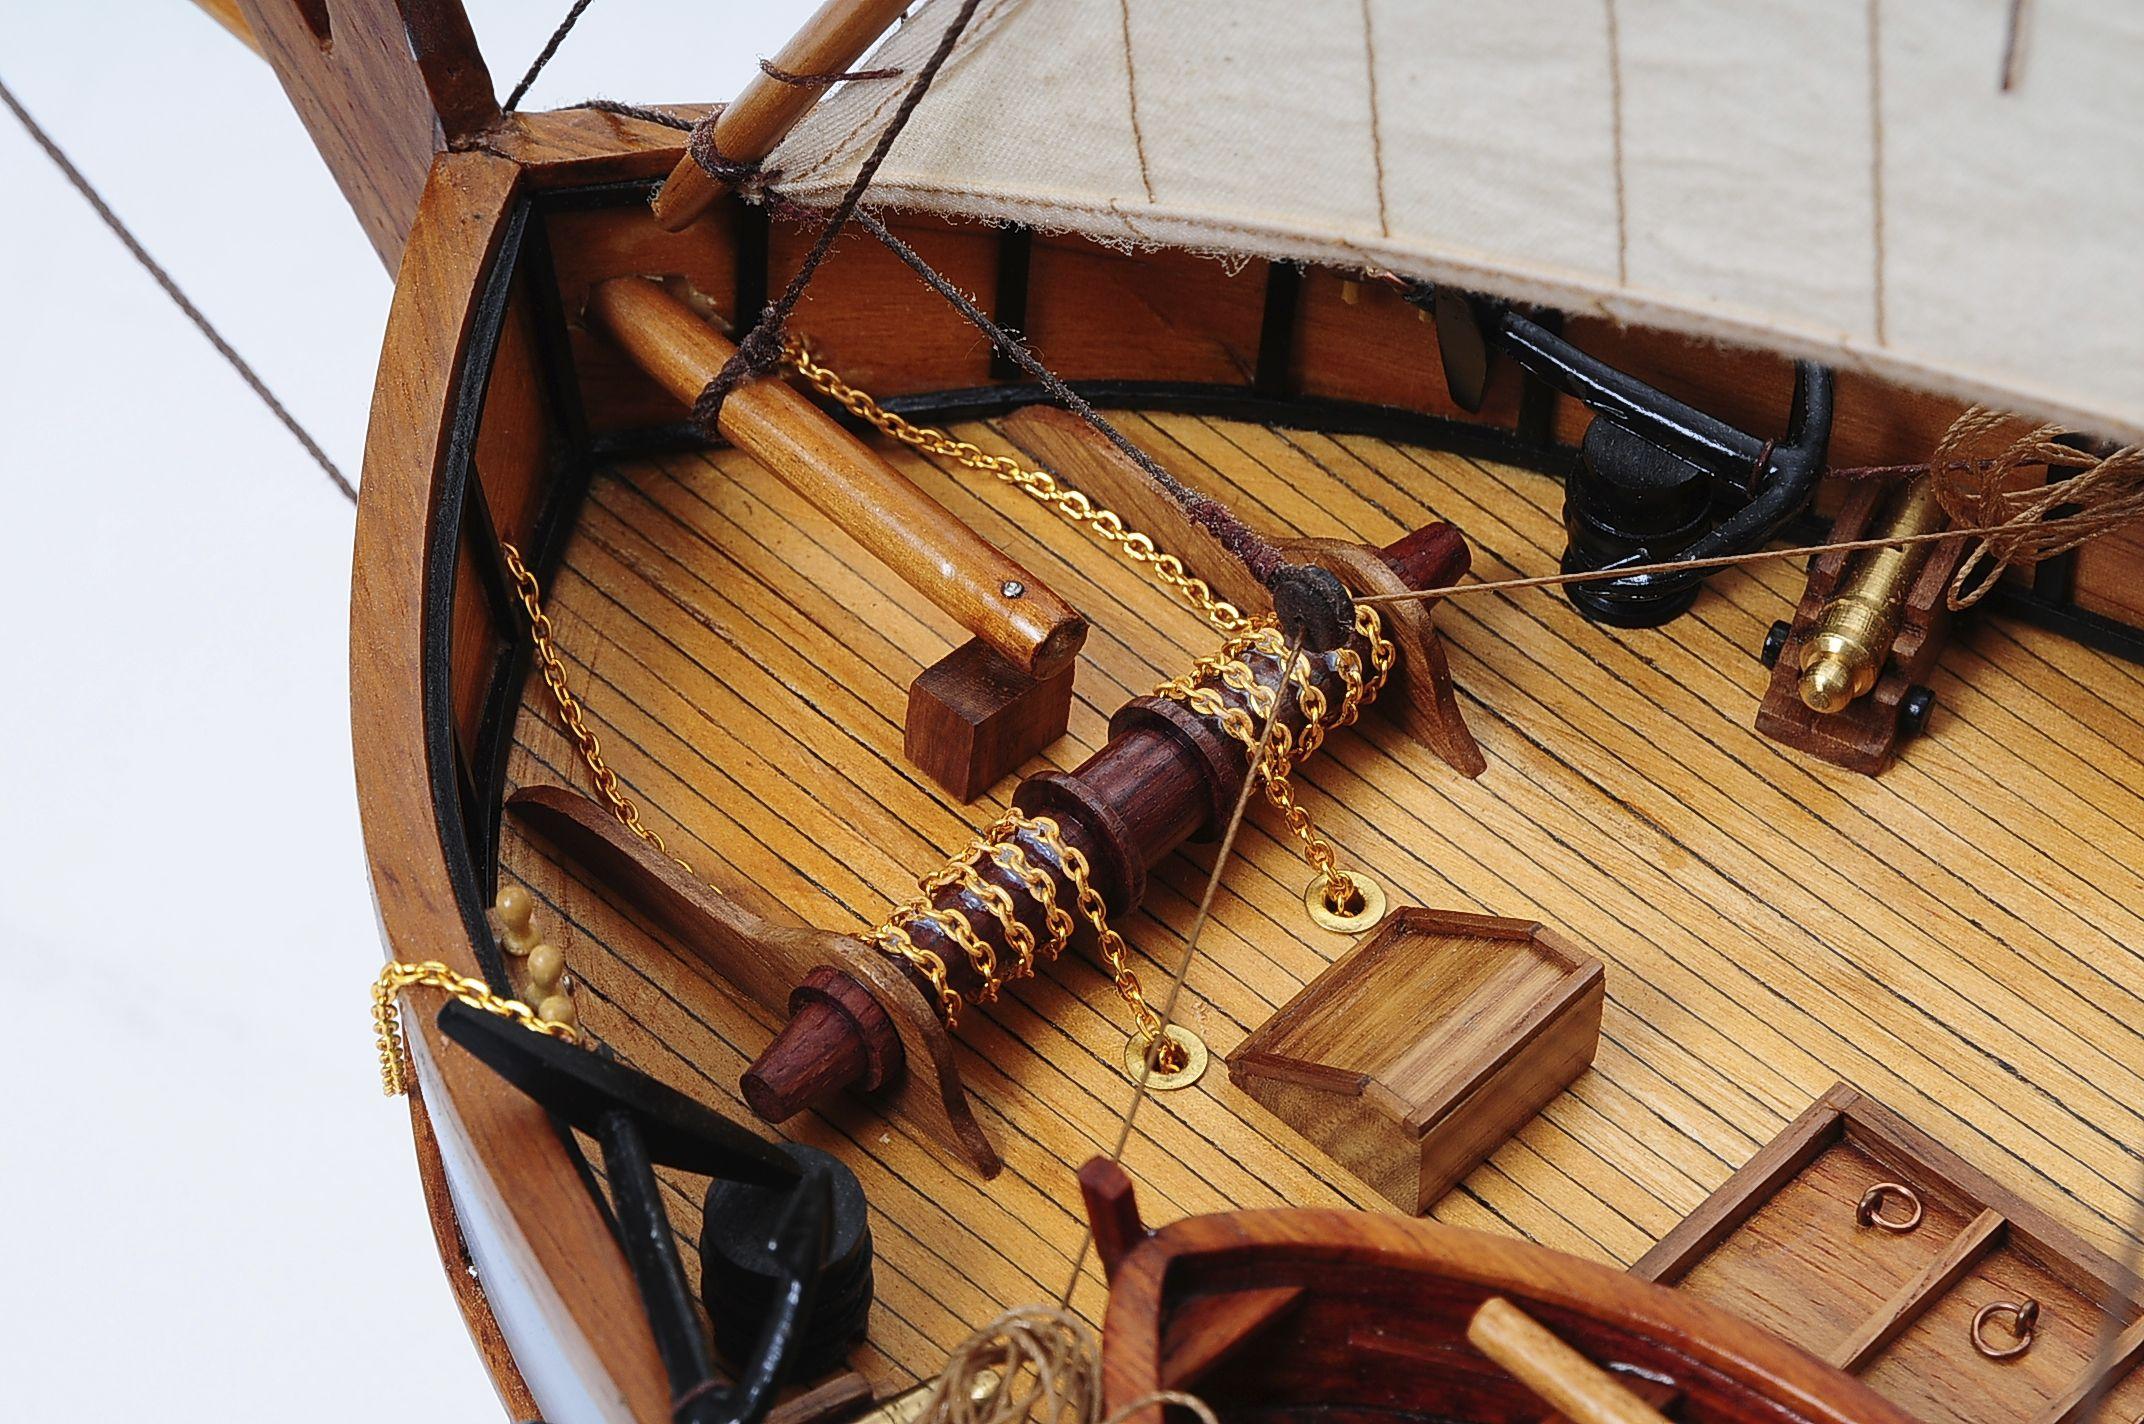 1429-6028-La-Nina-Model-Boat-Superior-Range